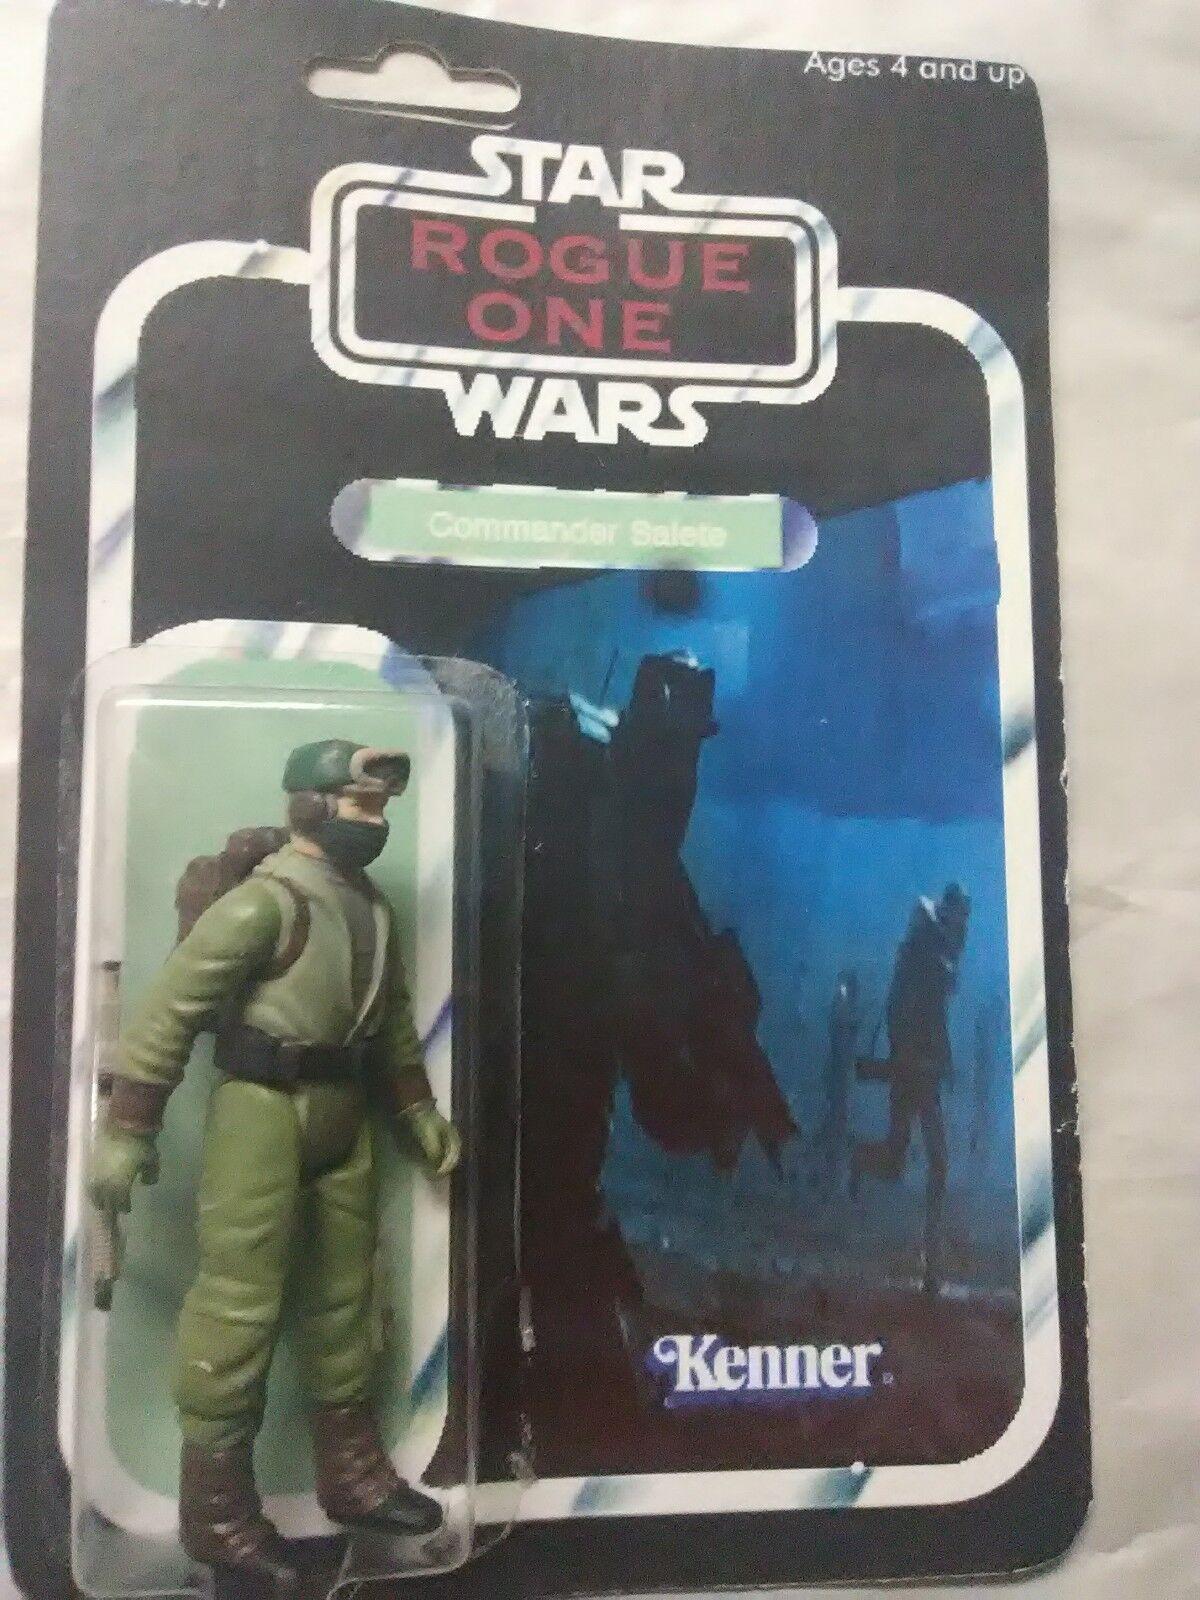 STAR WARS ROGUE ONE COMMANDER COMMANDER COMMANDER SALETE DKE BOOTLEG FIGURE 1 1 & CASE 2b9a77